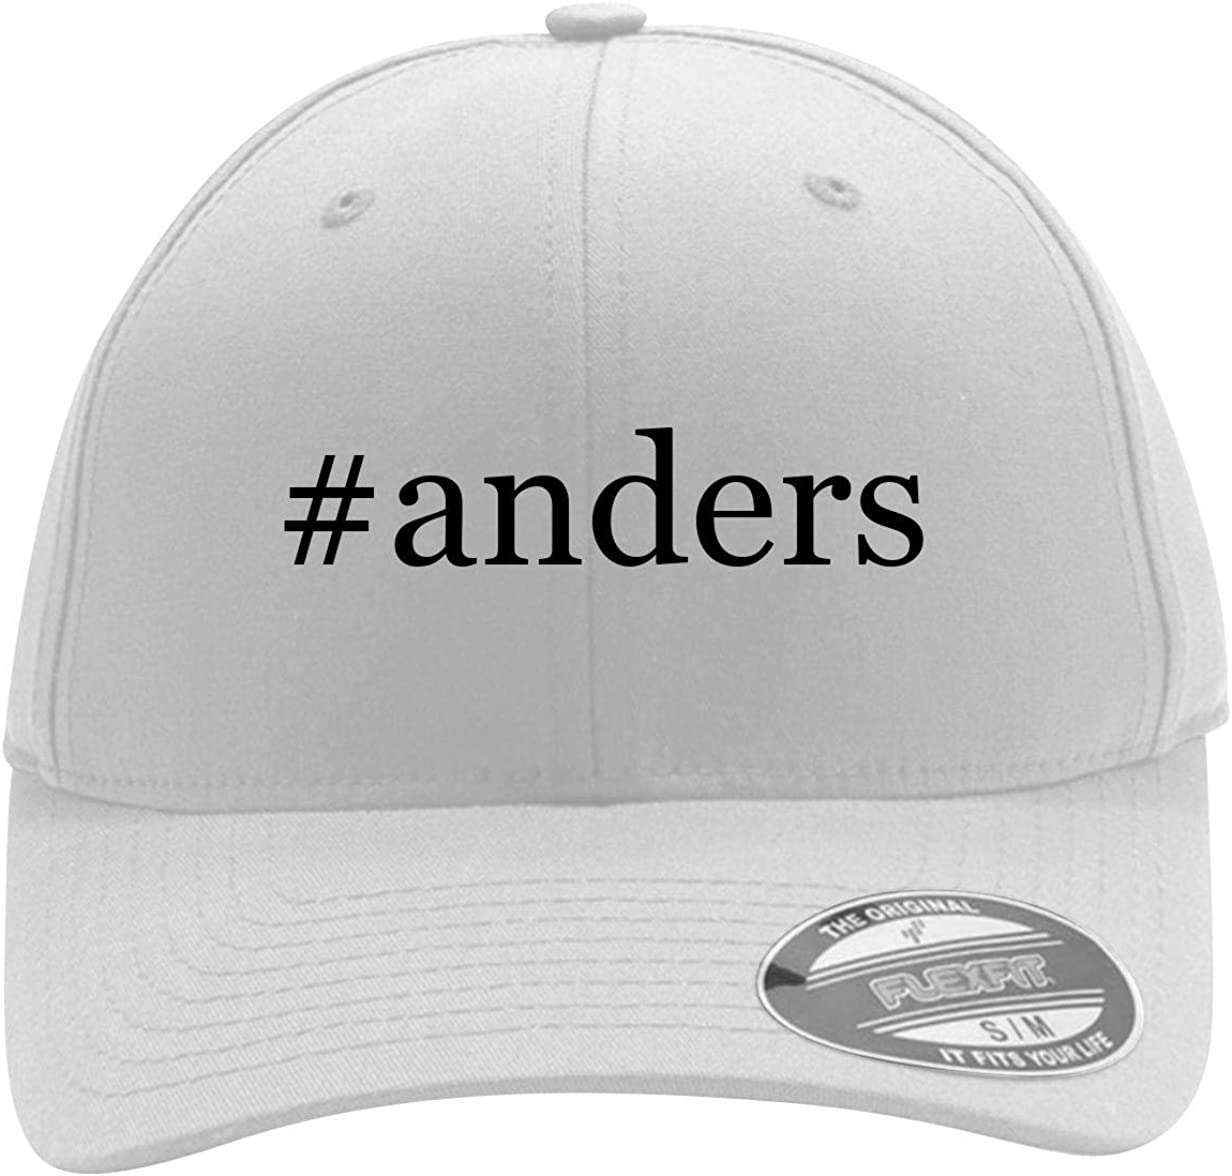 #Anders - Men'S Hashtag Flexfit Baseball Cap Hat